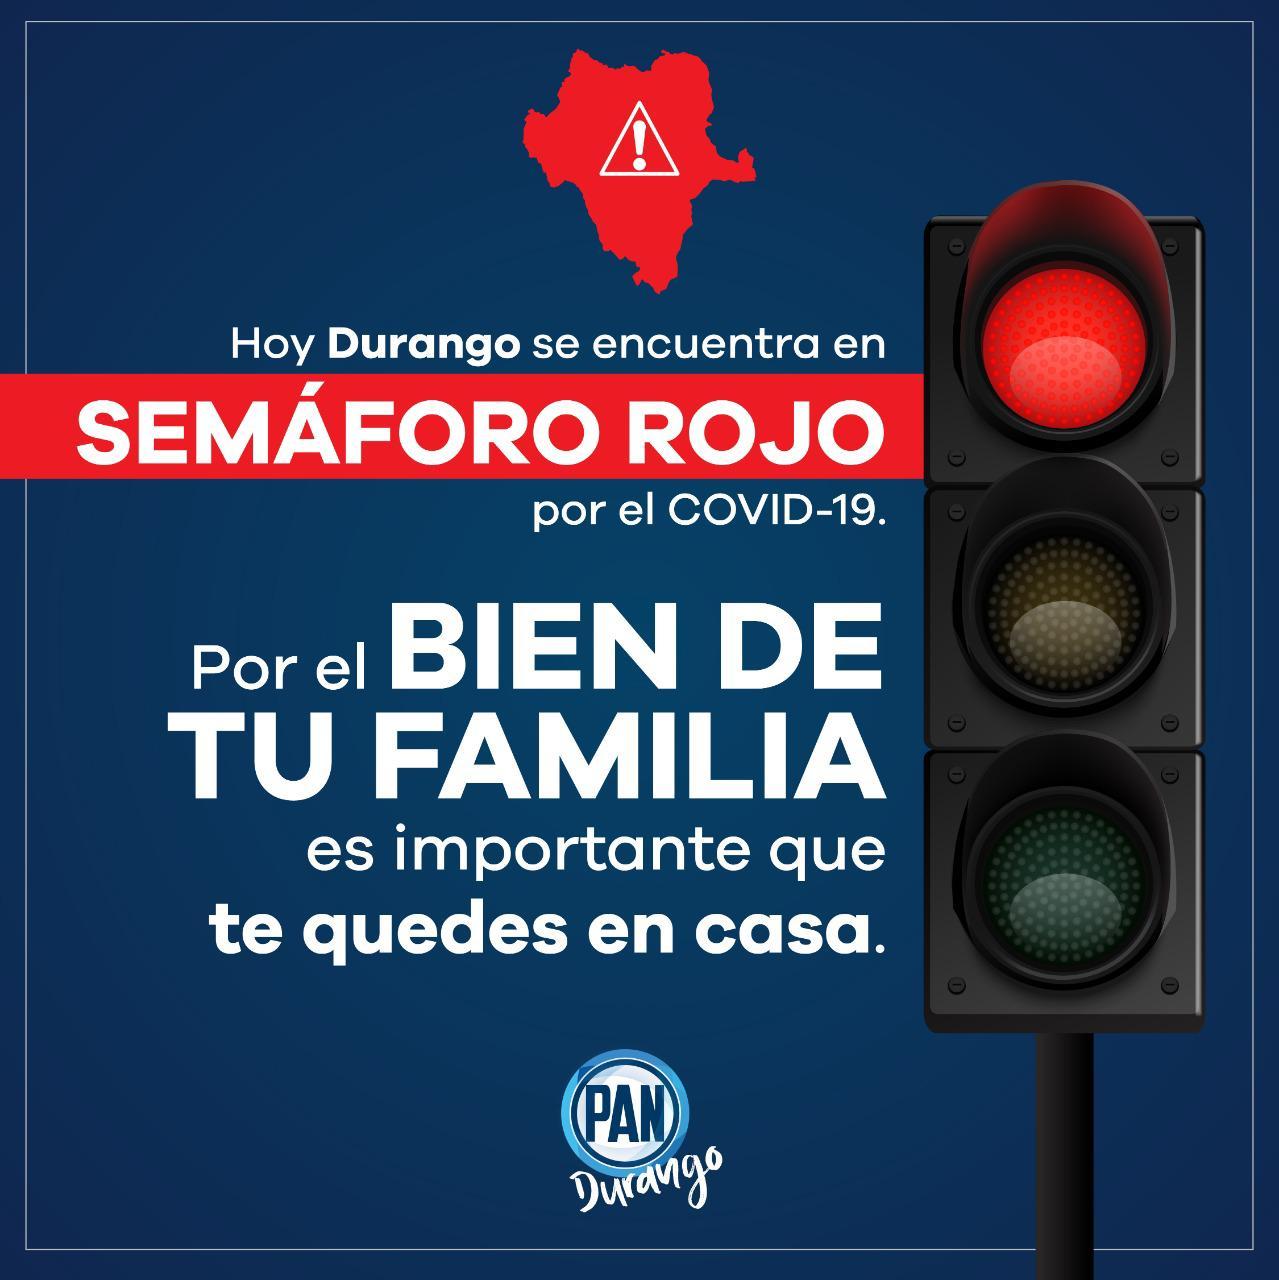 Durango En Semáforo Rojo